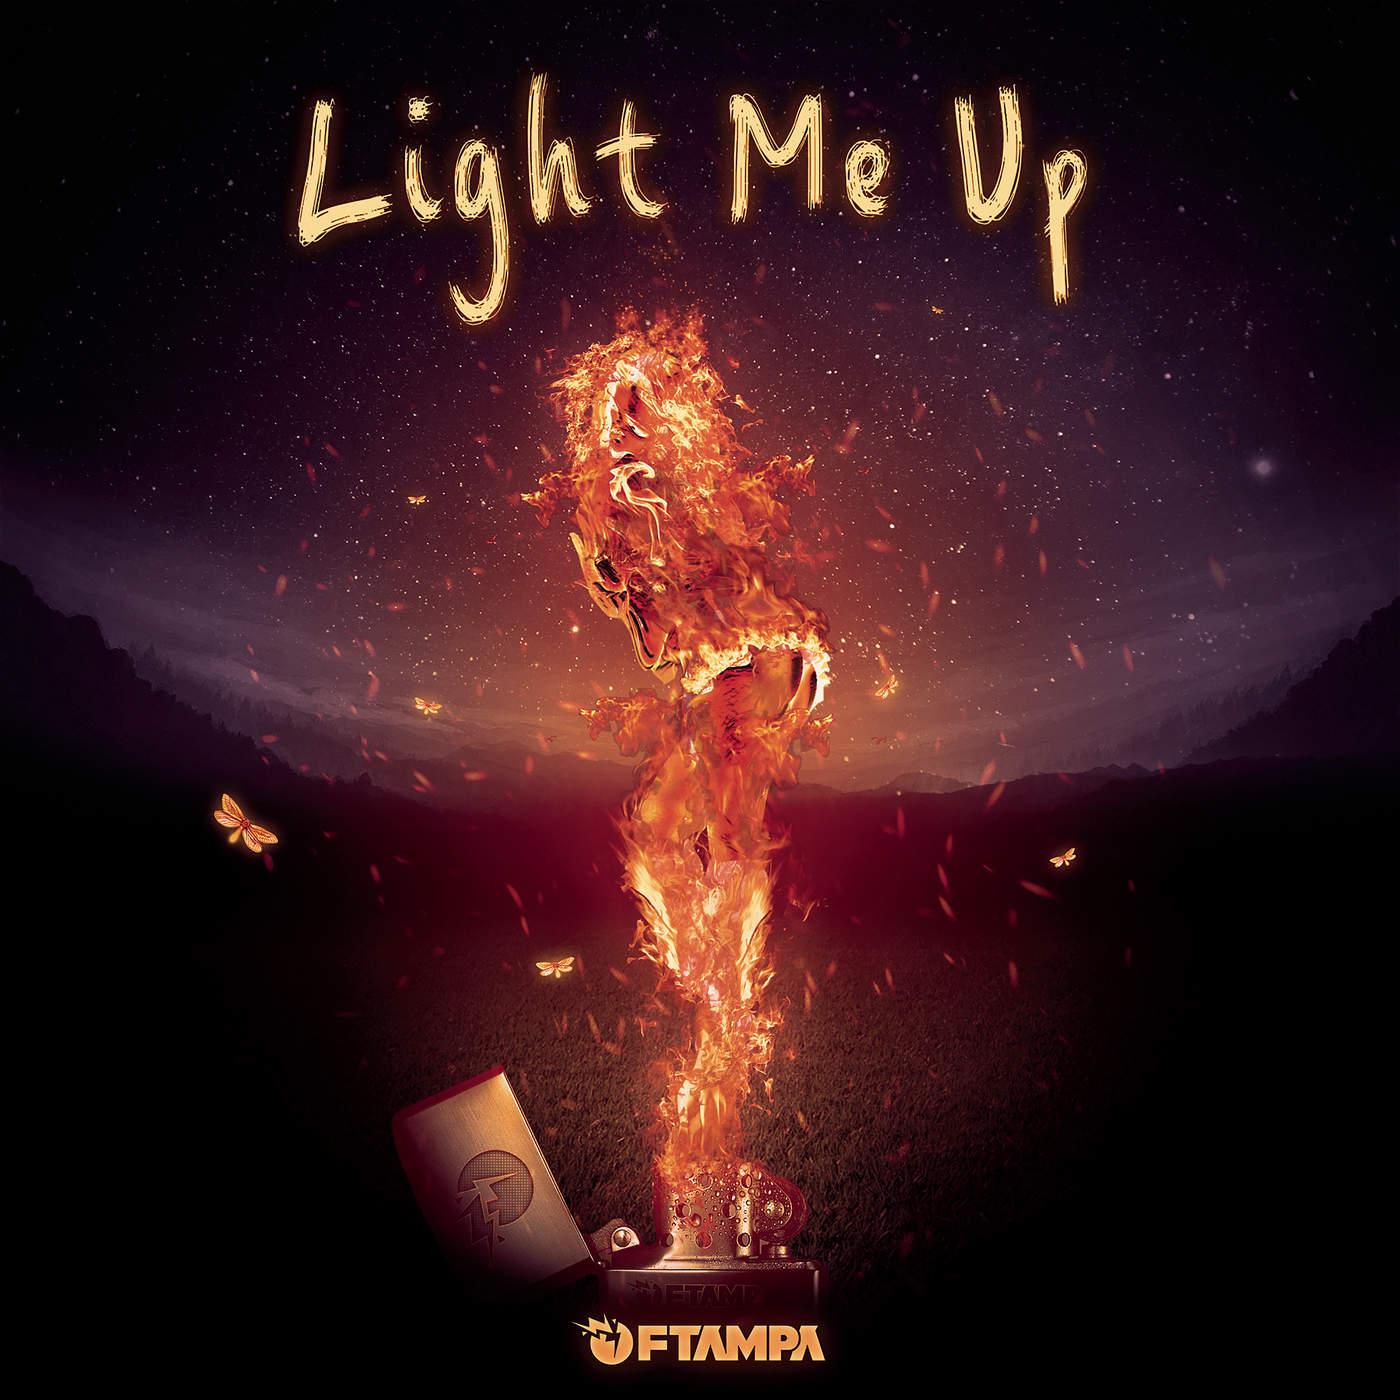 FTampa - Light Me Up - Single